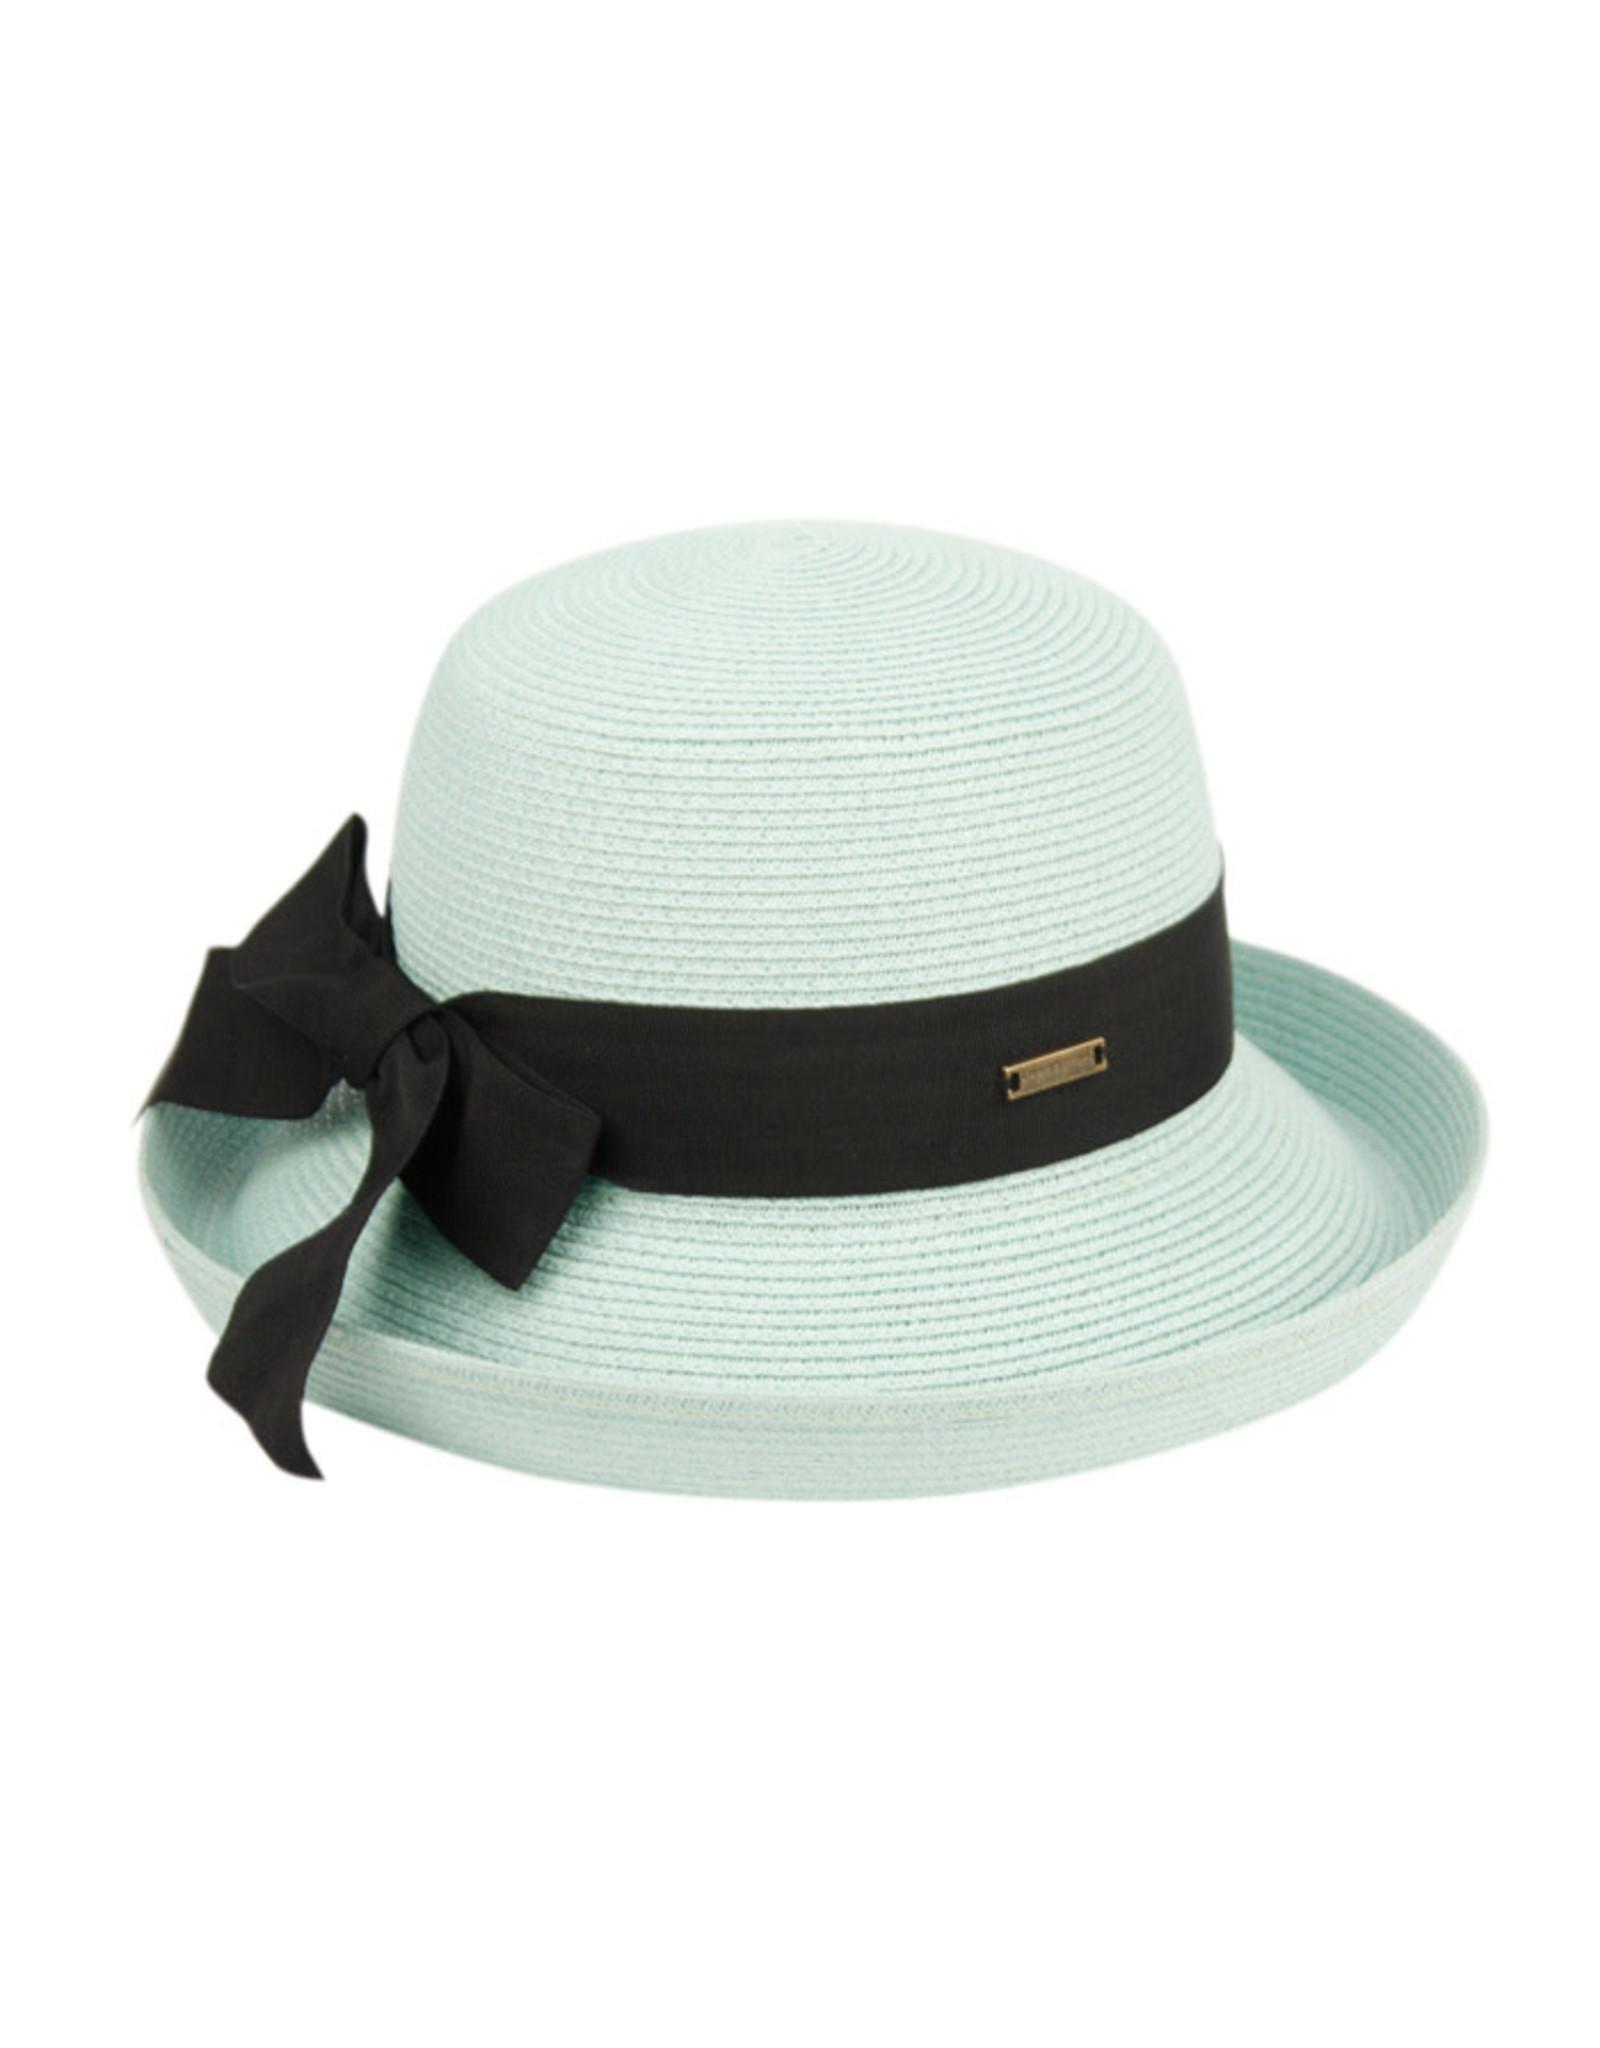 Hat roll up brim sun